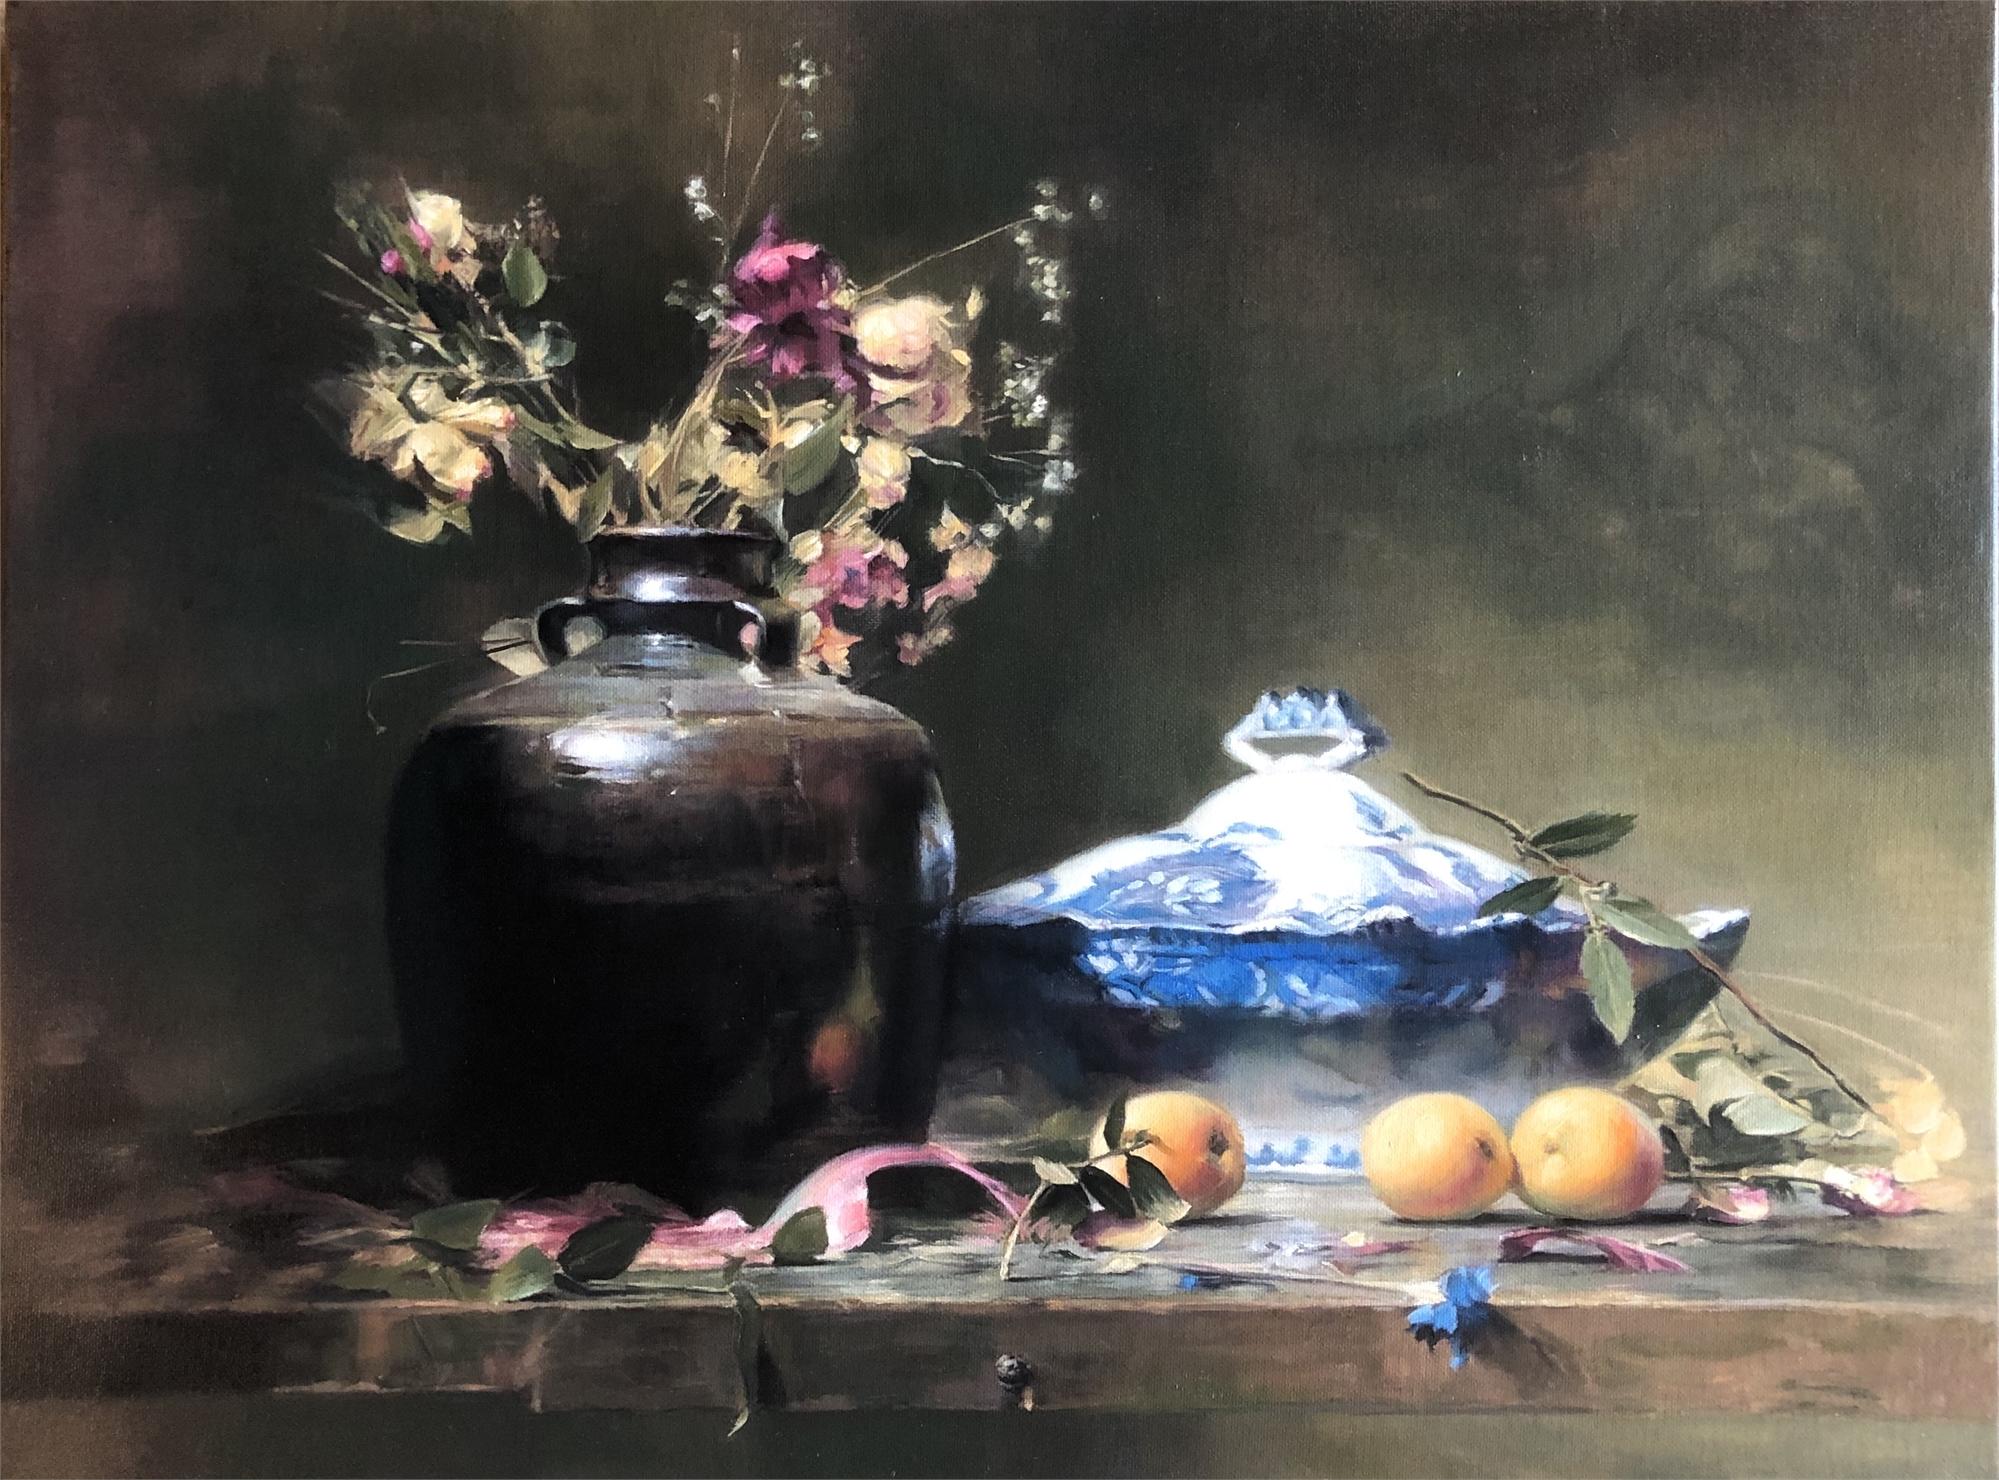 Still Life with Blue Vase by Juan Suarez Rodriguez